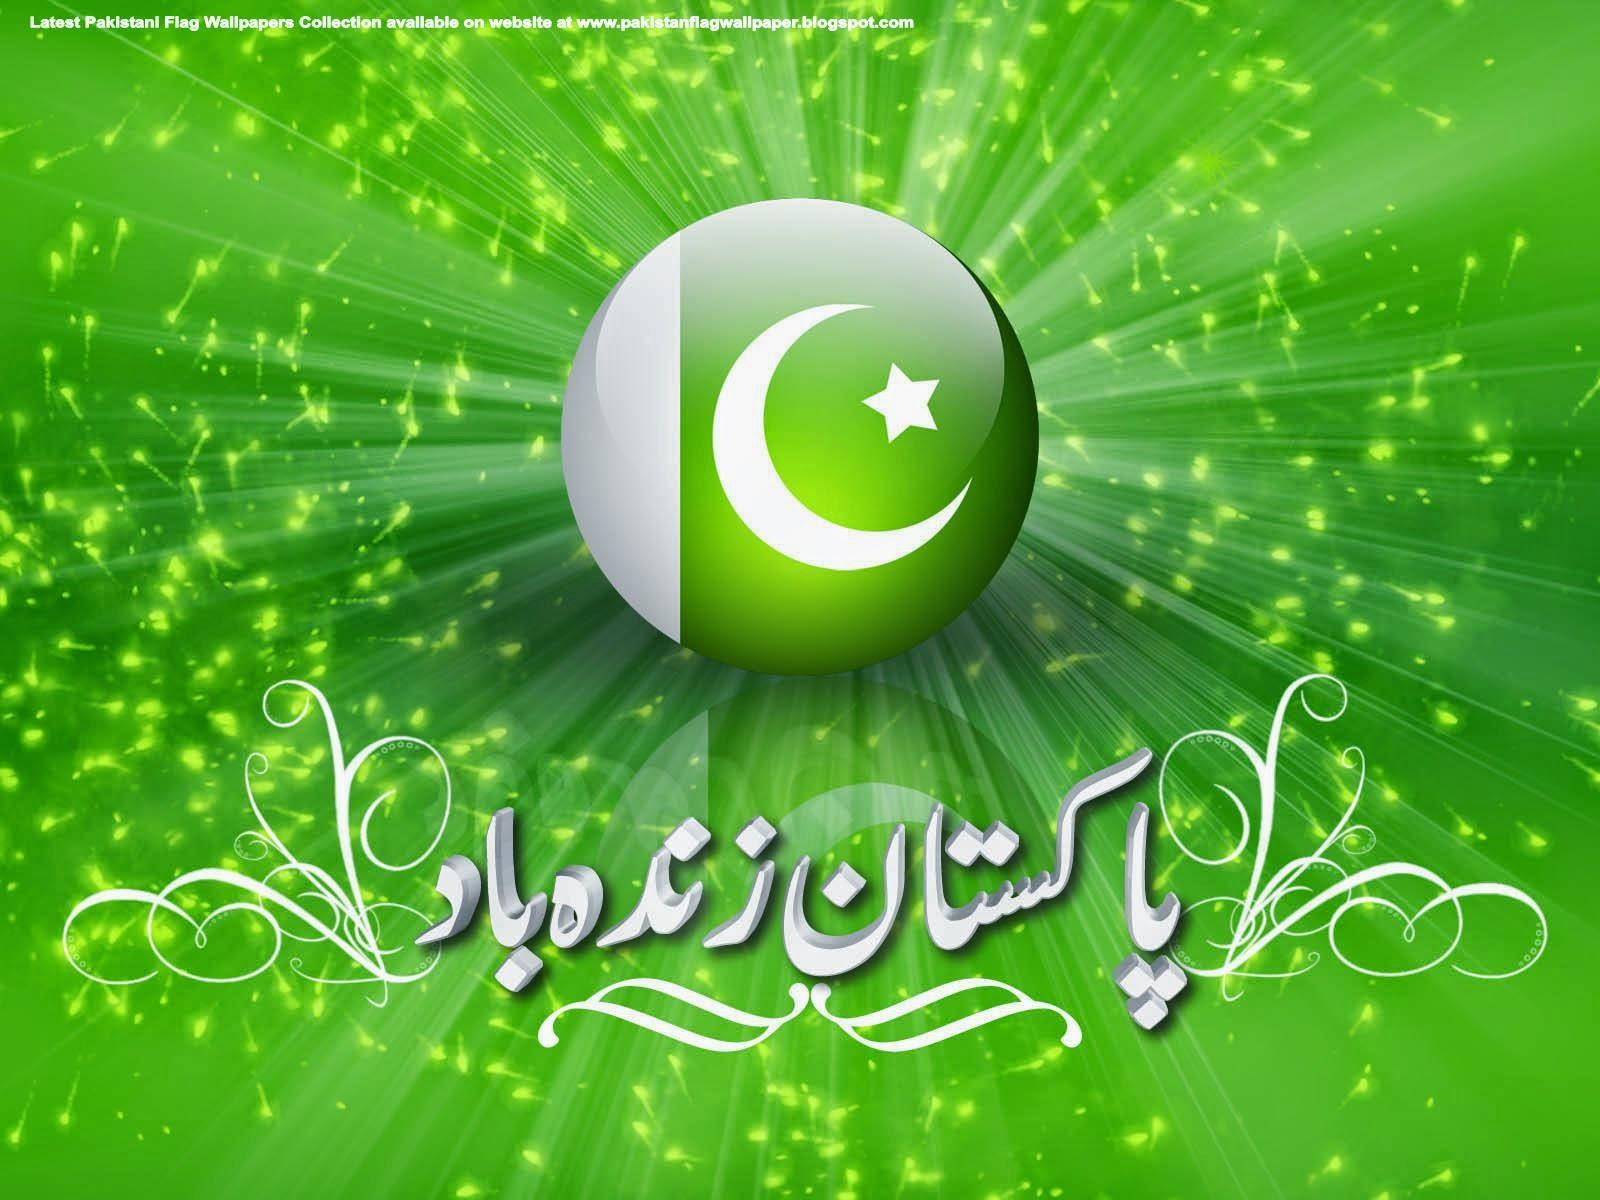 pakistan flag wallpaper pakistan flag wallpaper